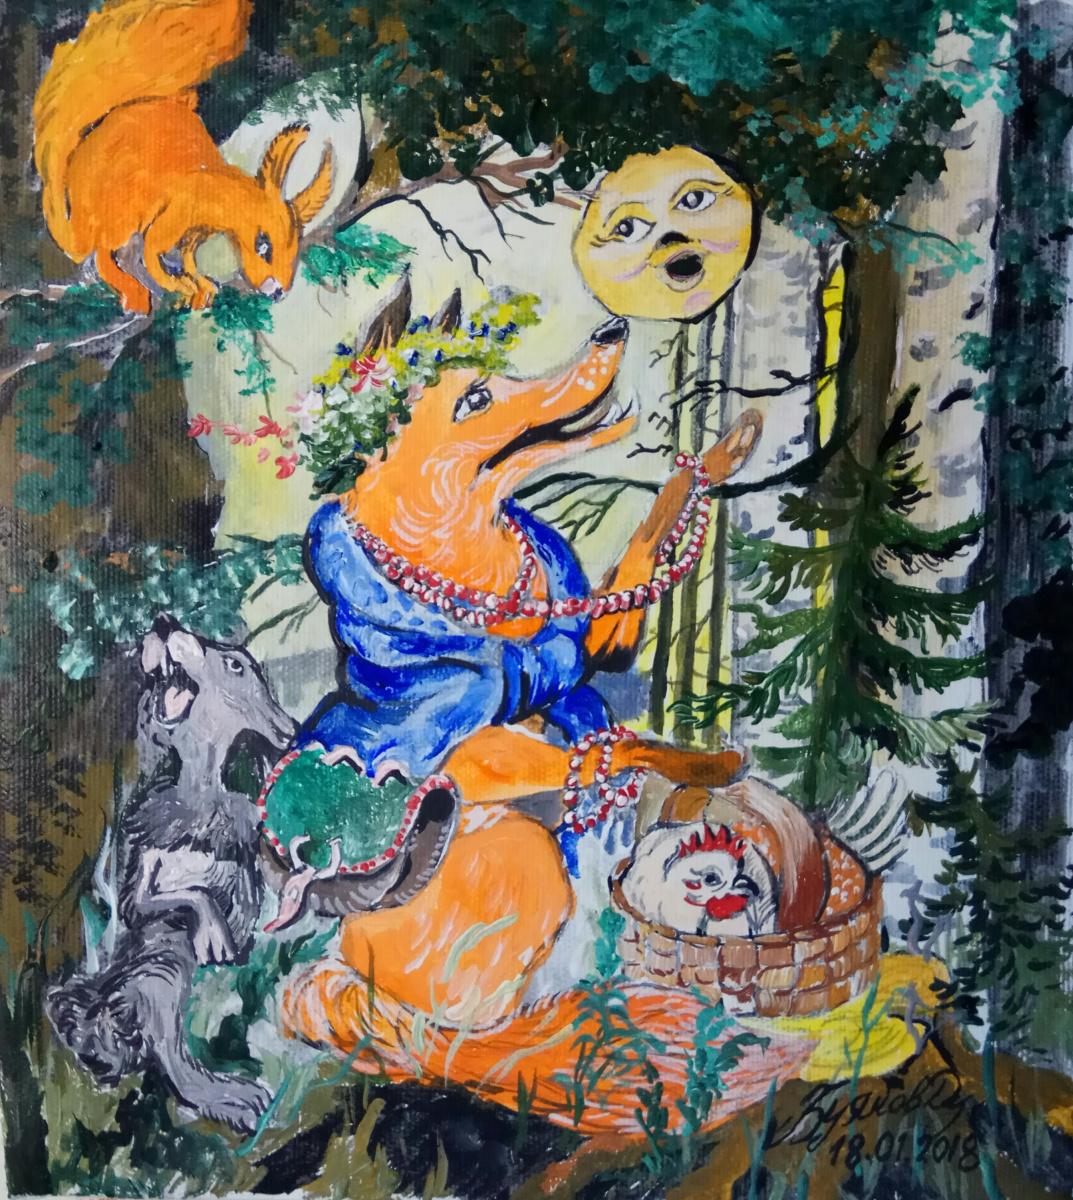 Дмитрий Юрьевич Буянов. The Fox and the Gingerbread man